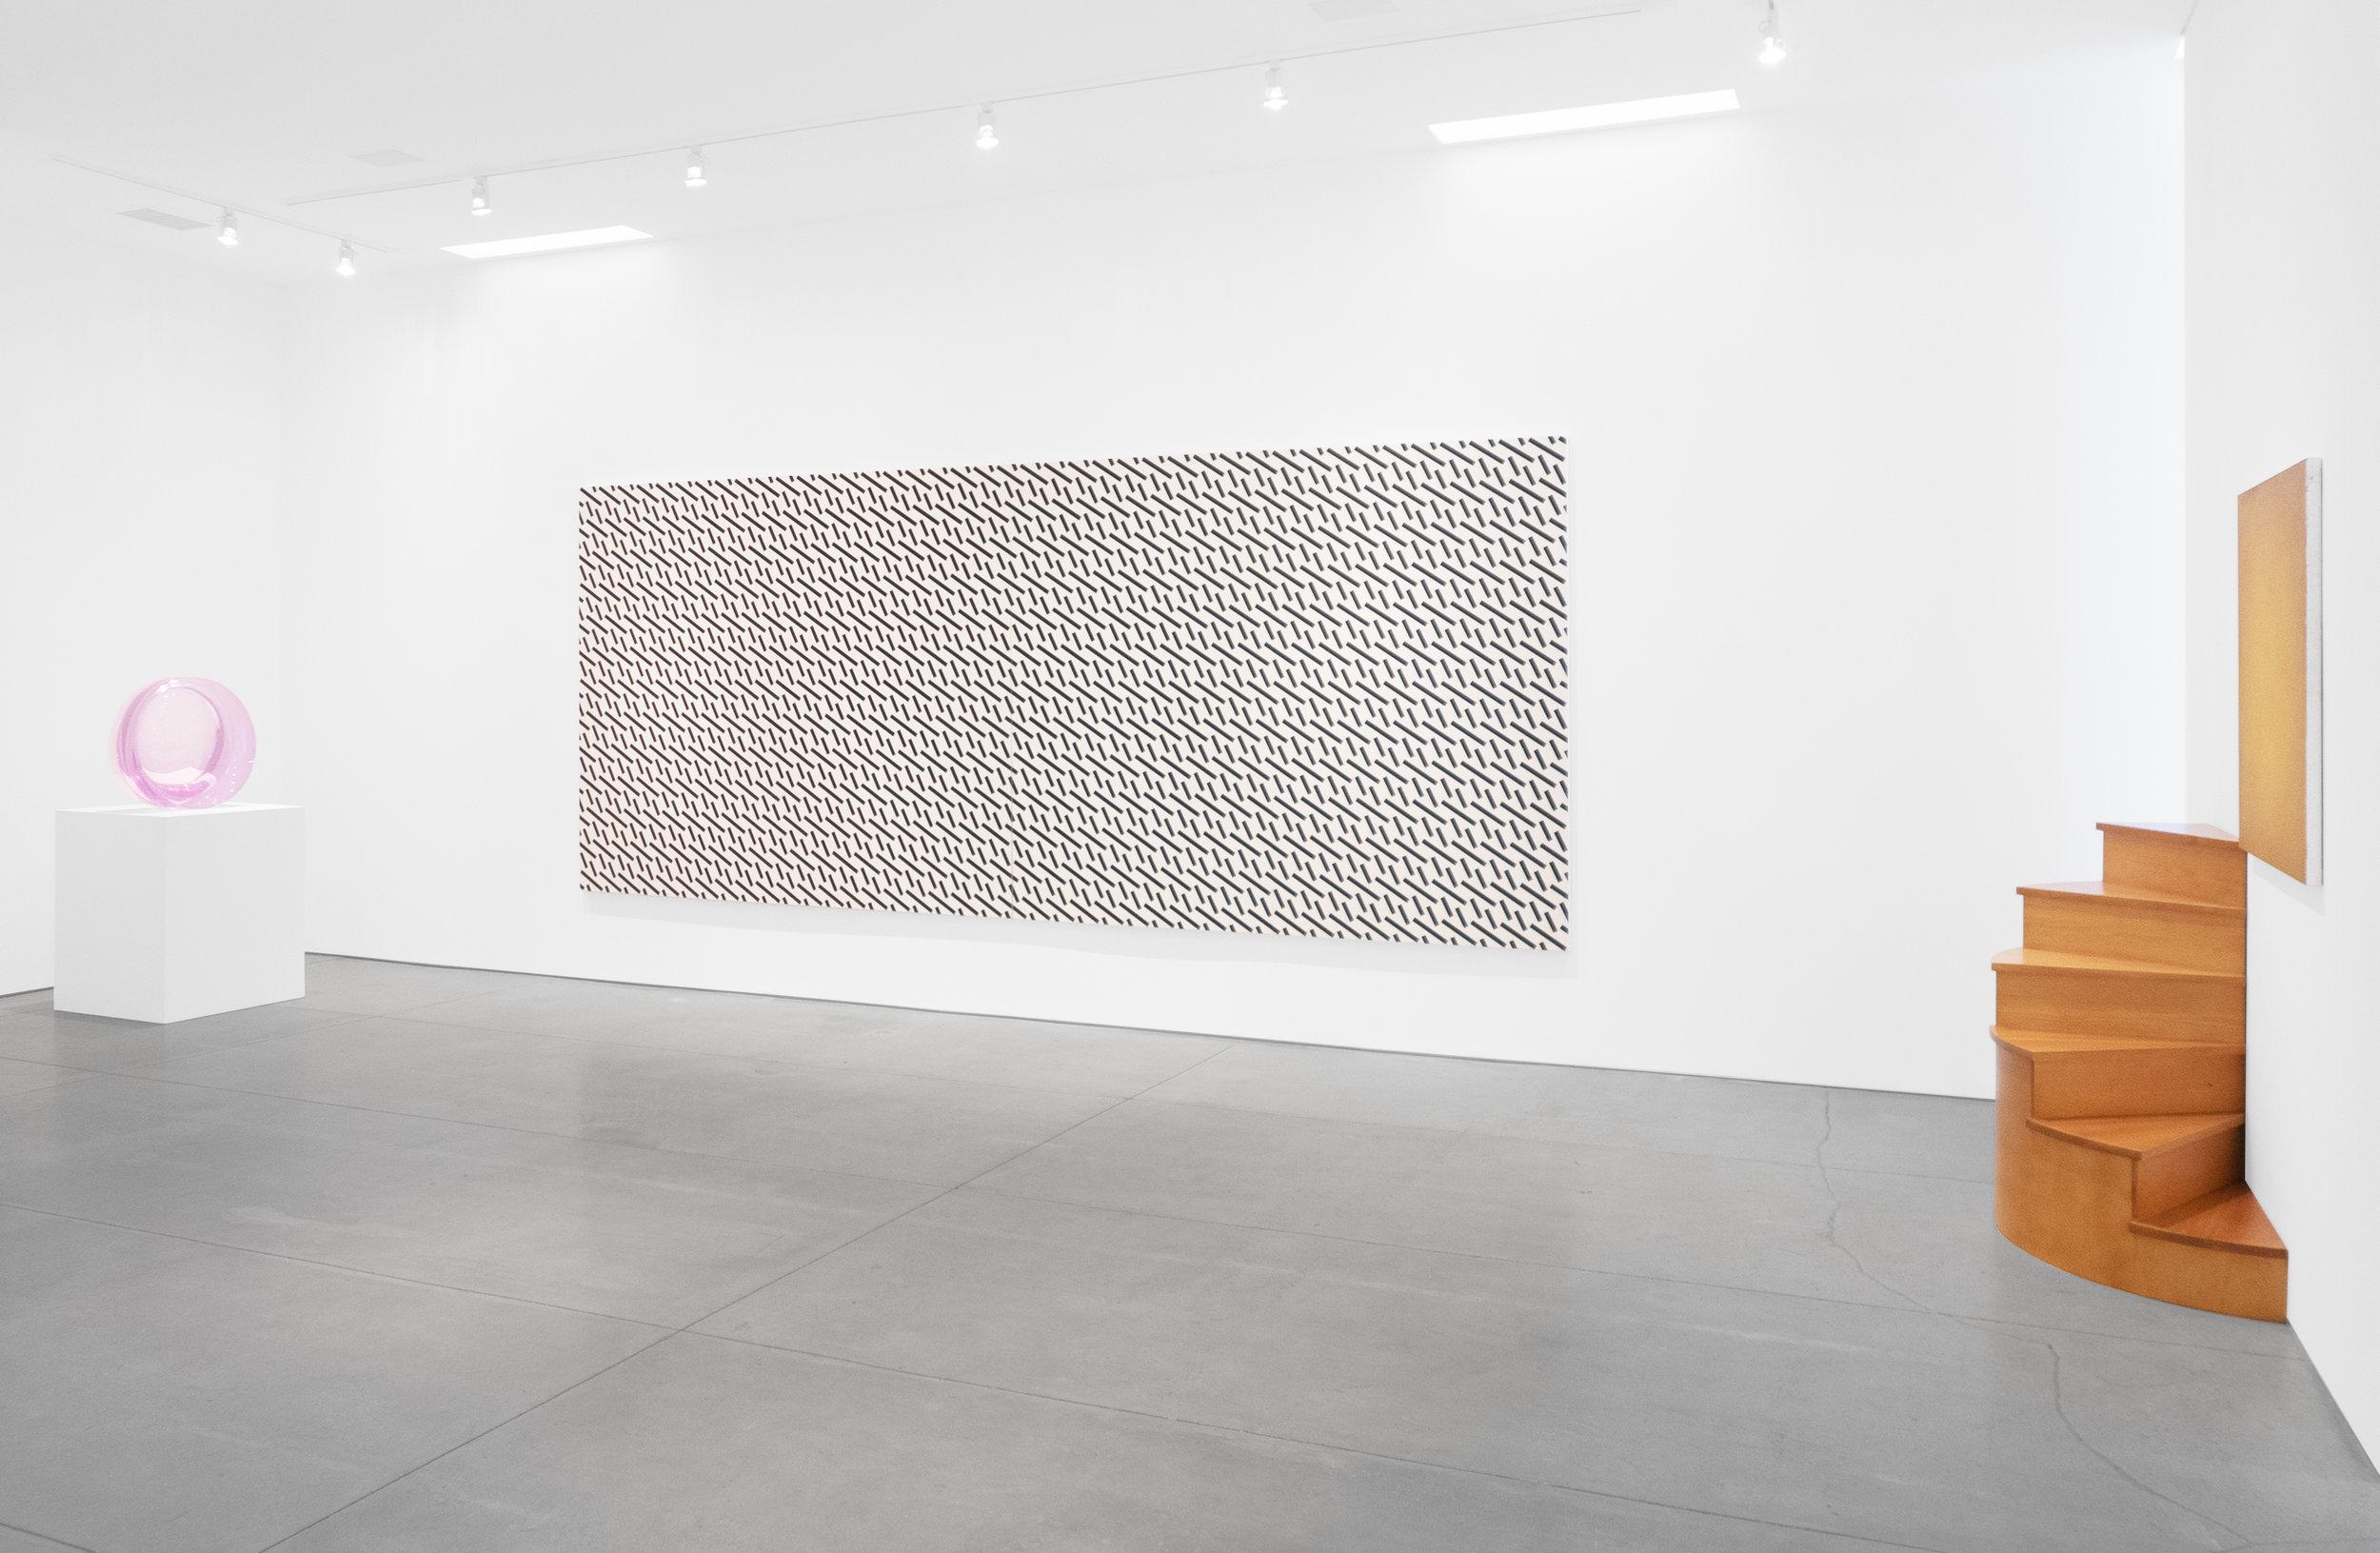 25 Years_Peter Blake Gallery_2019_Installation View_21.jpg